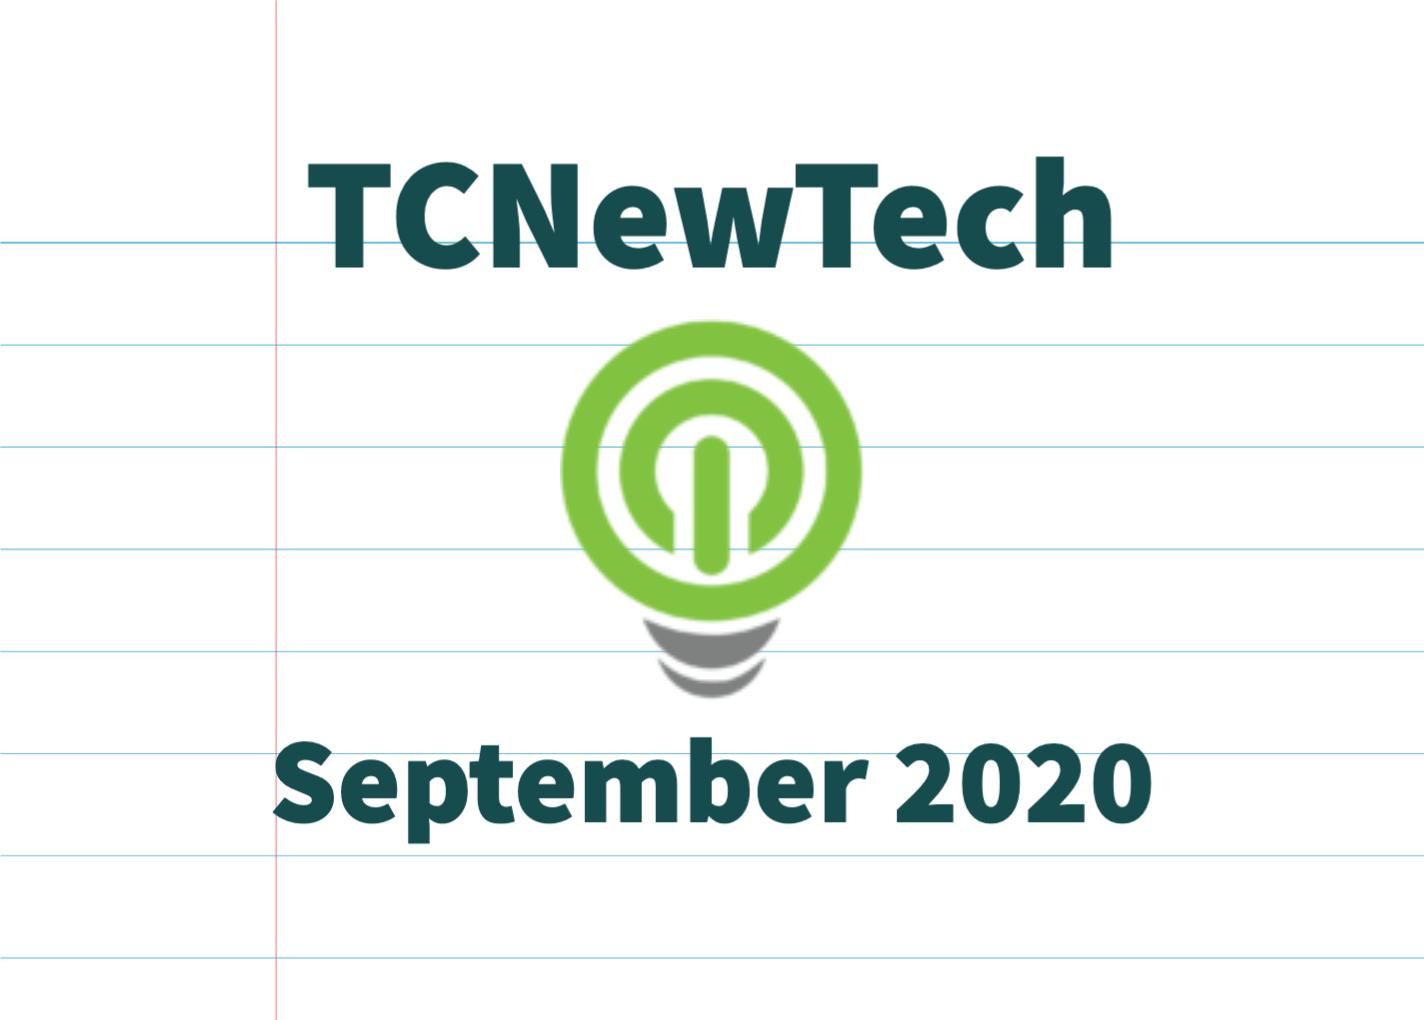 TCNewTech Pitch Contest September 2020